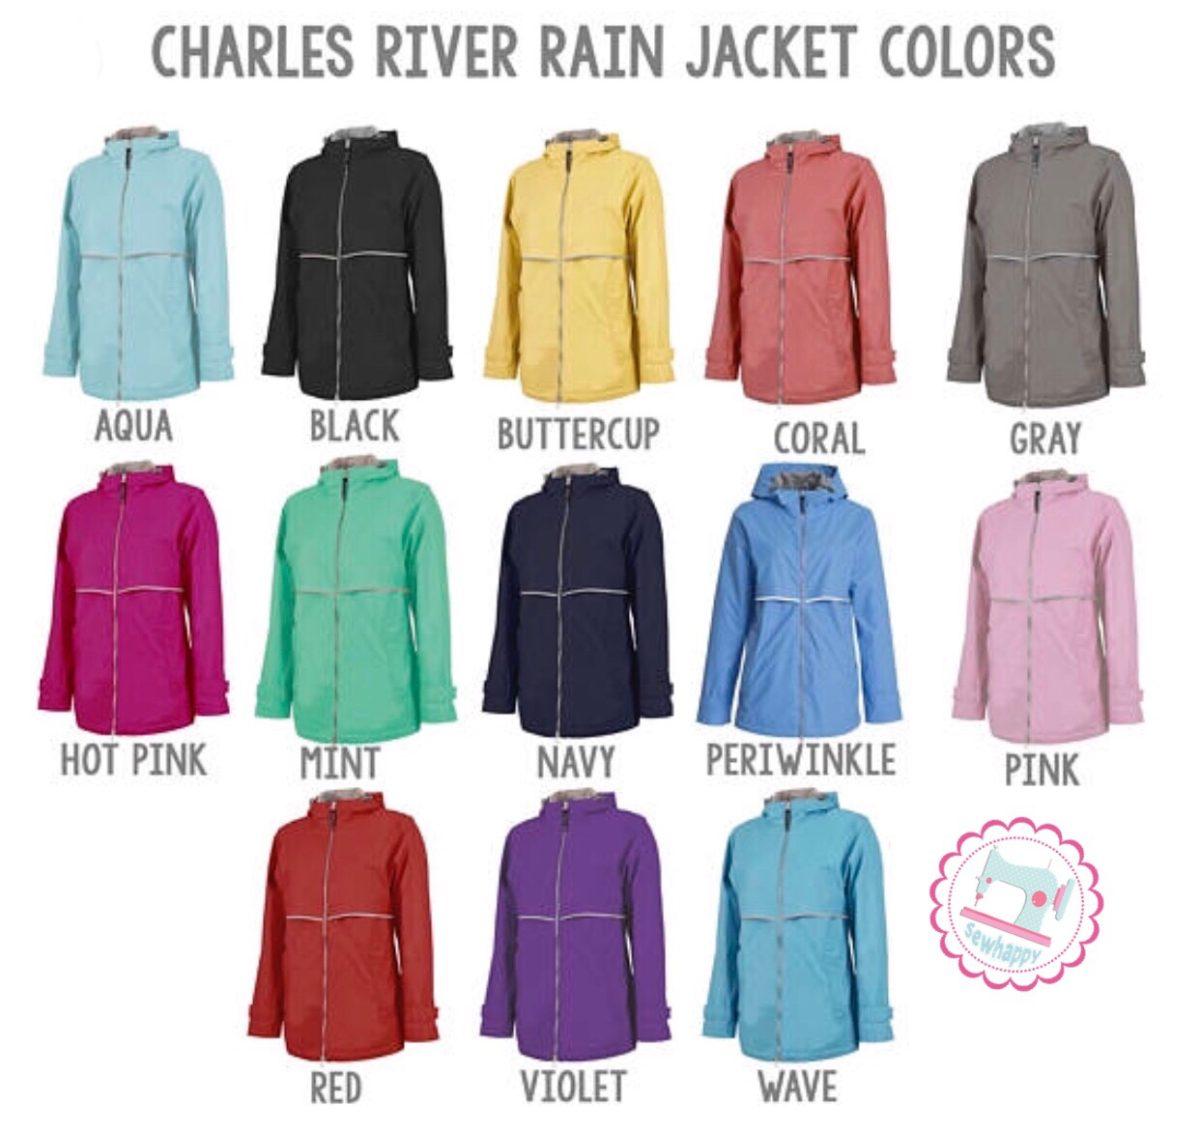 Charles River Raincoats